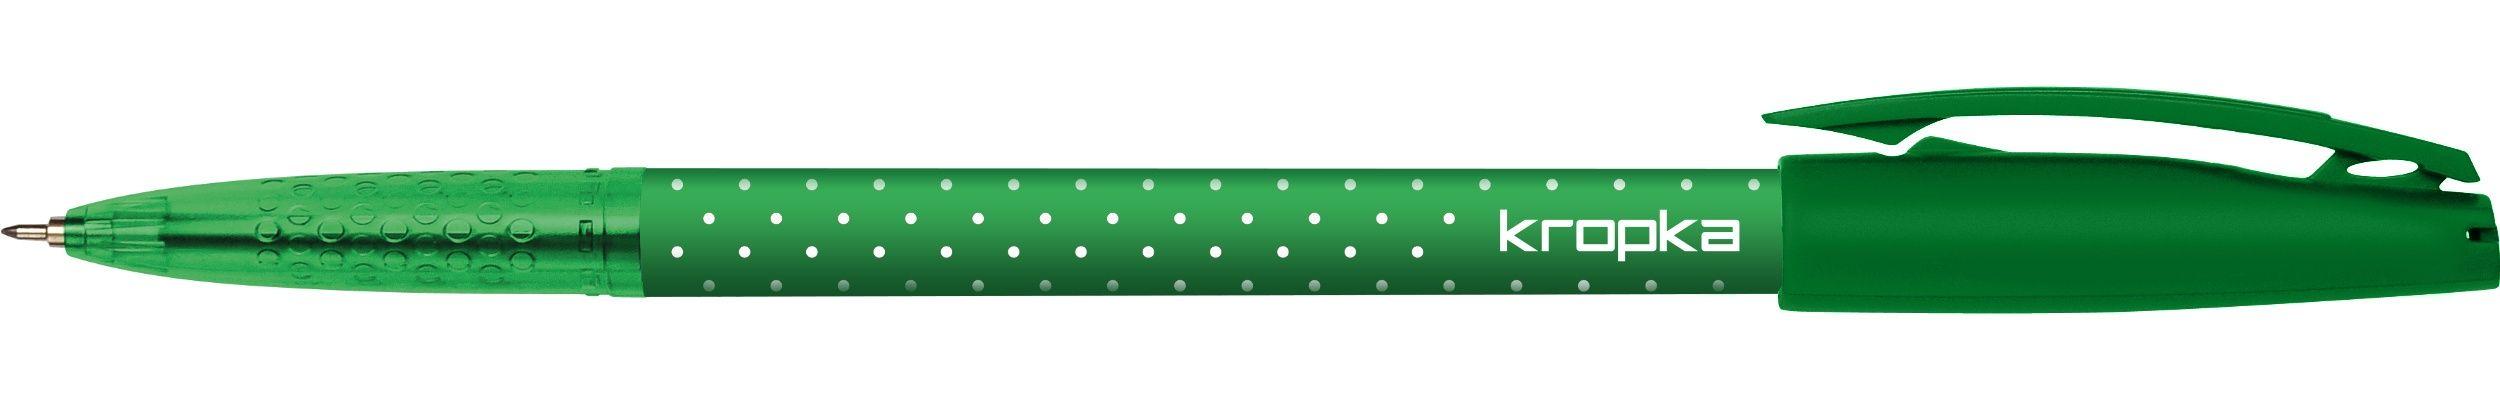 Kropka Ballpoint Pen